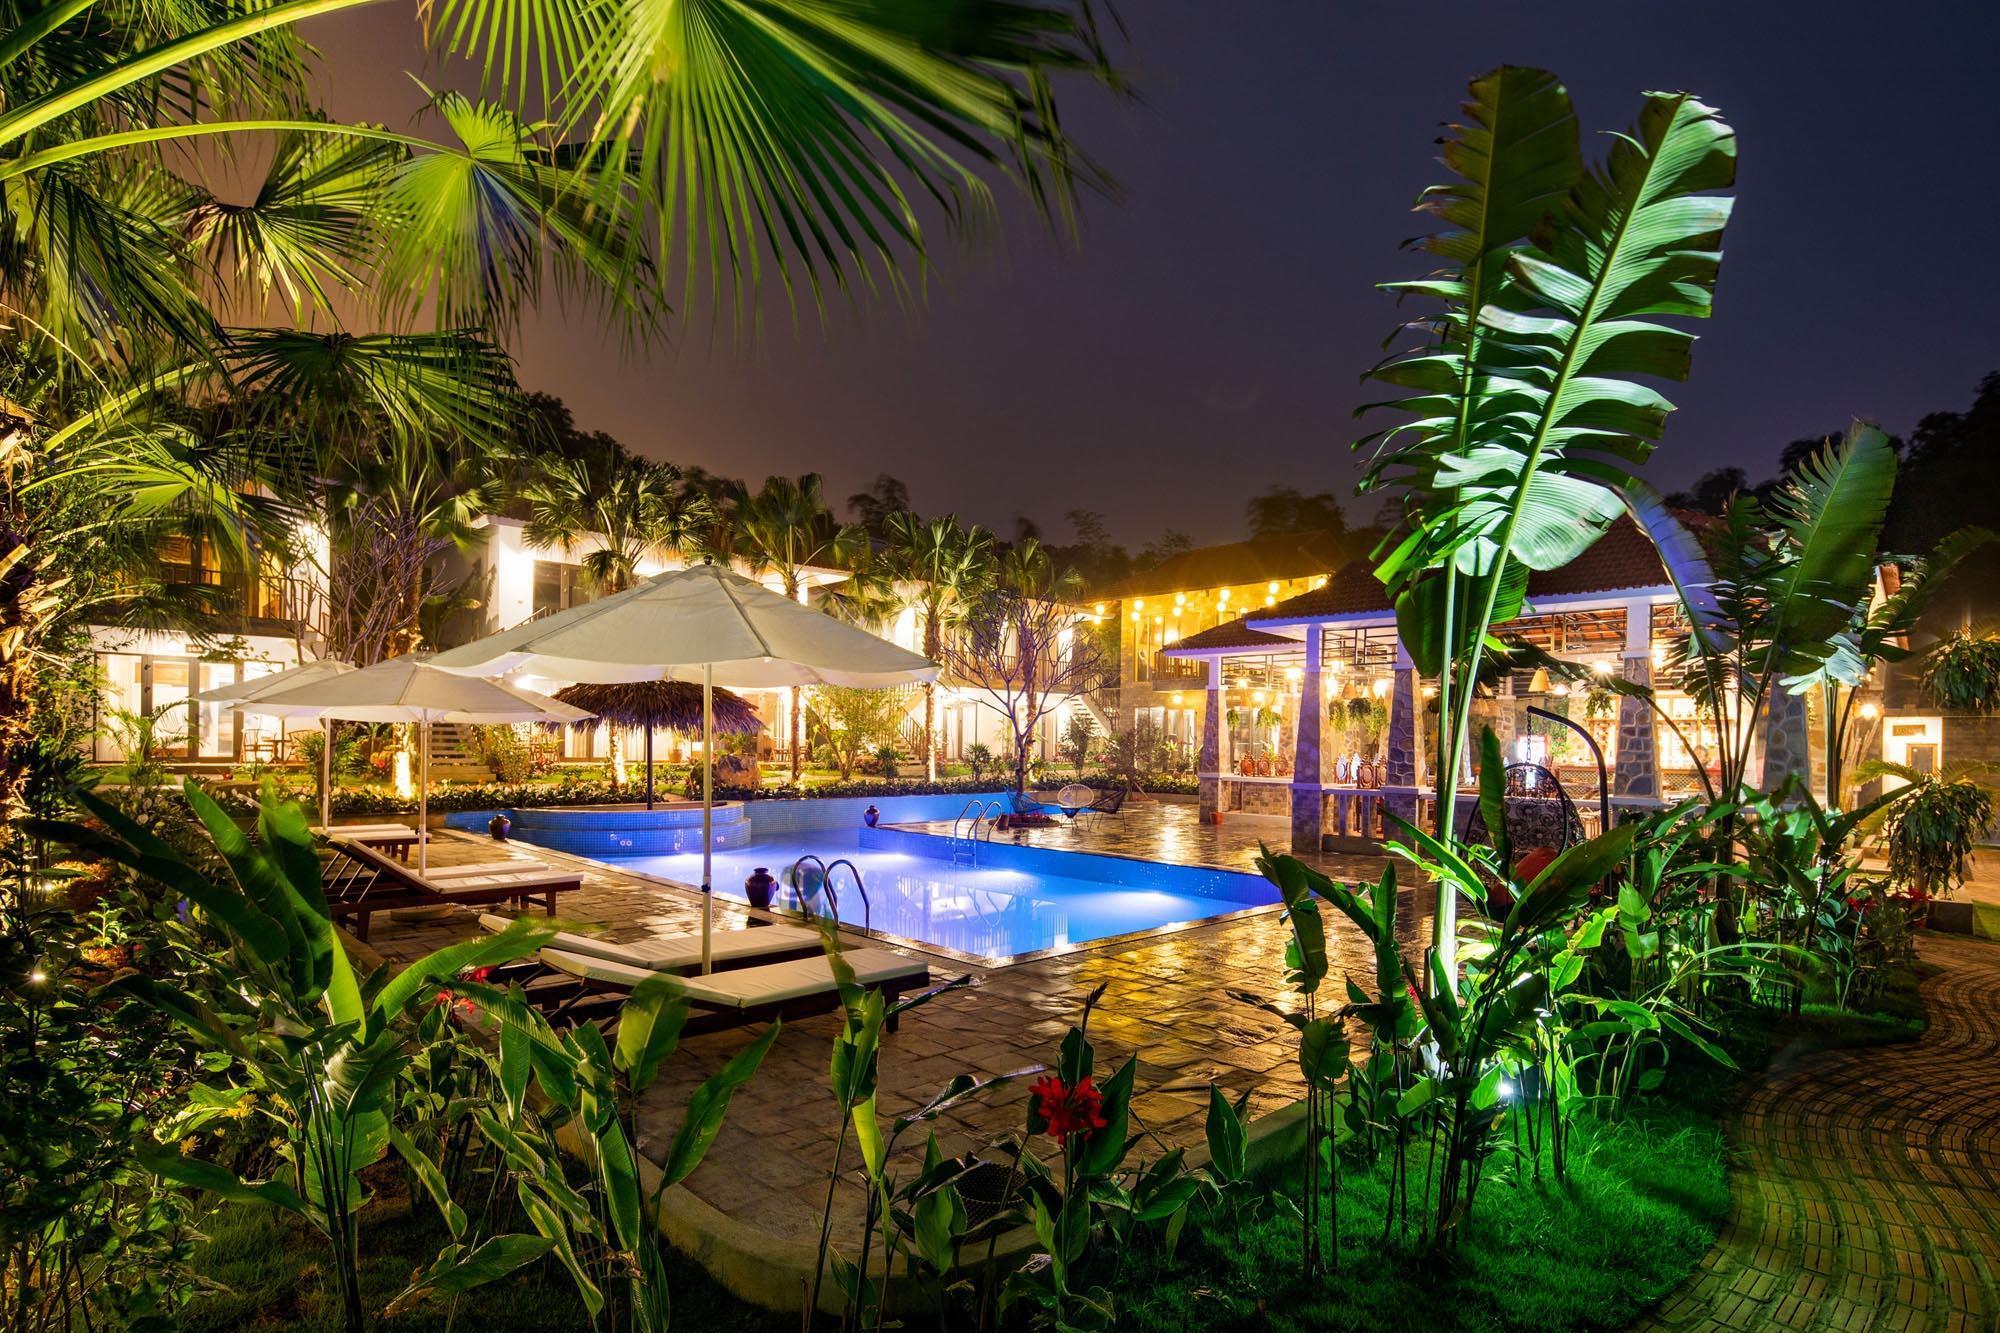 Bai Dinh Garden Resort And Spa